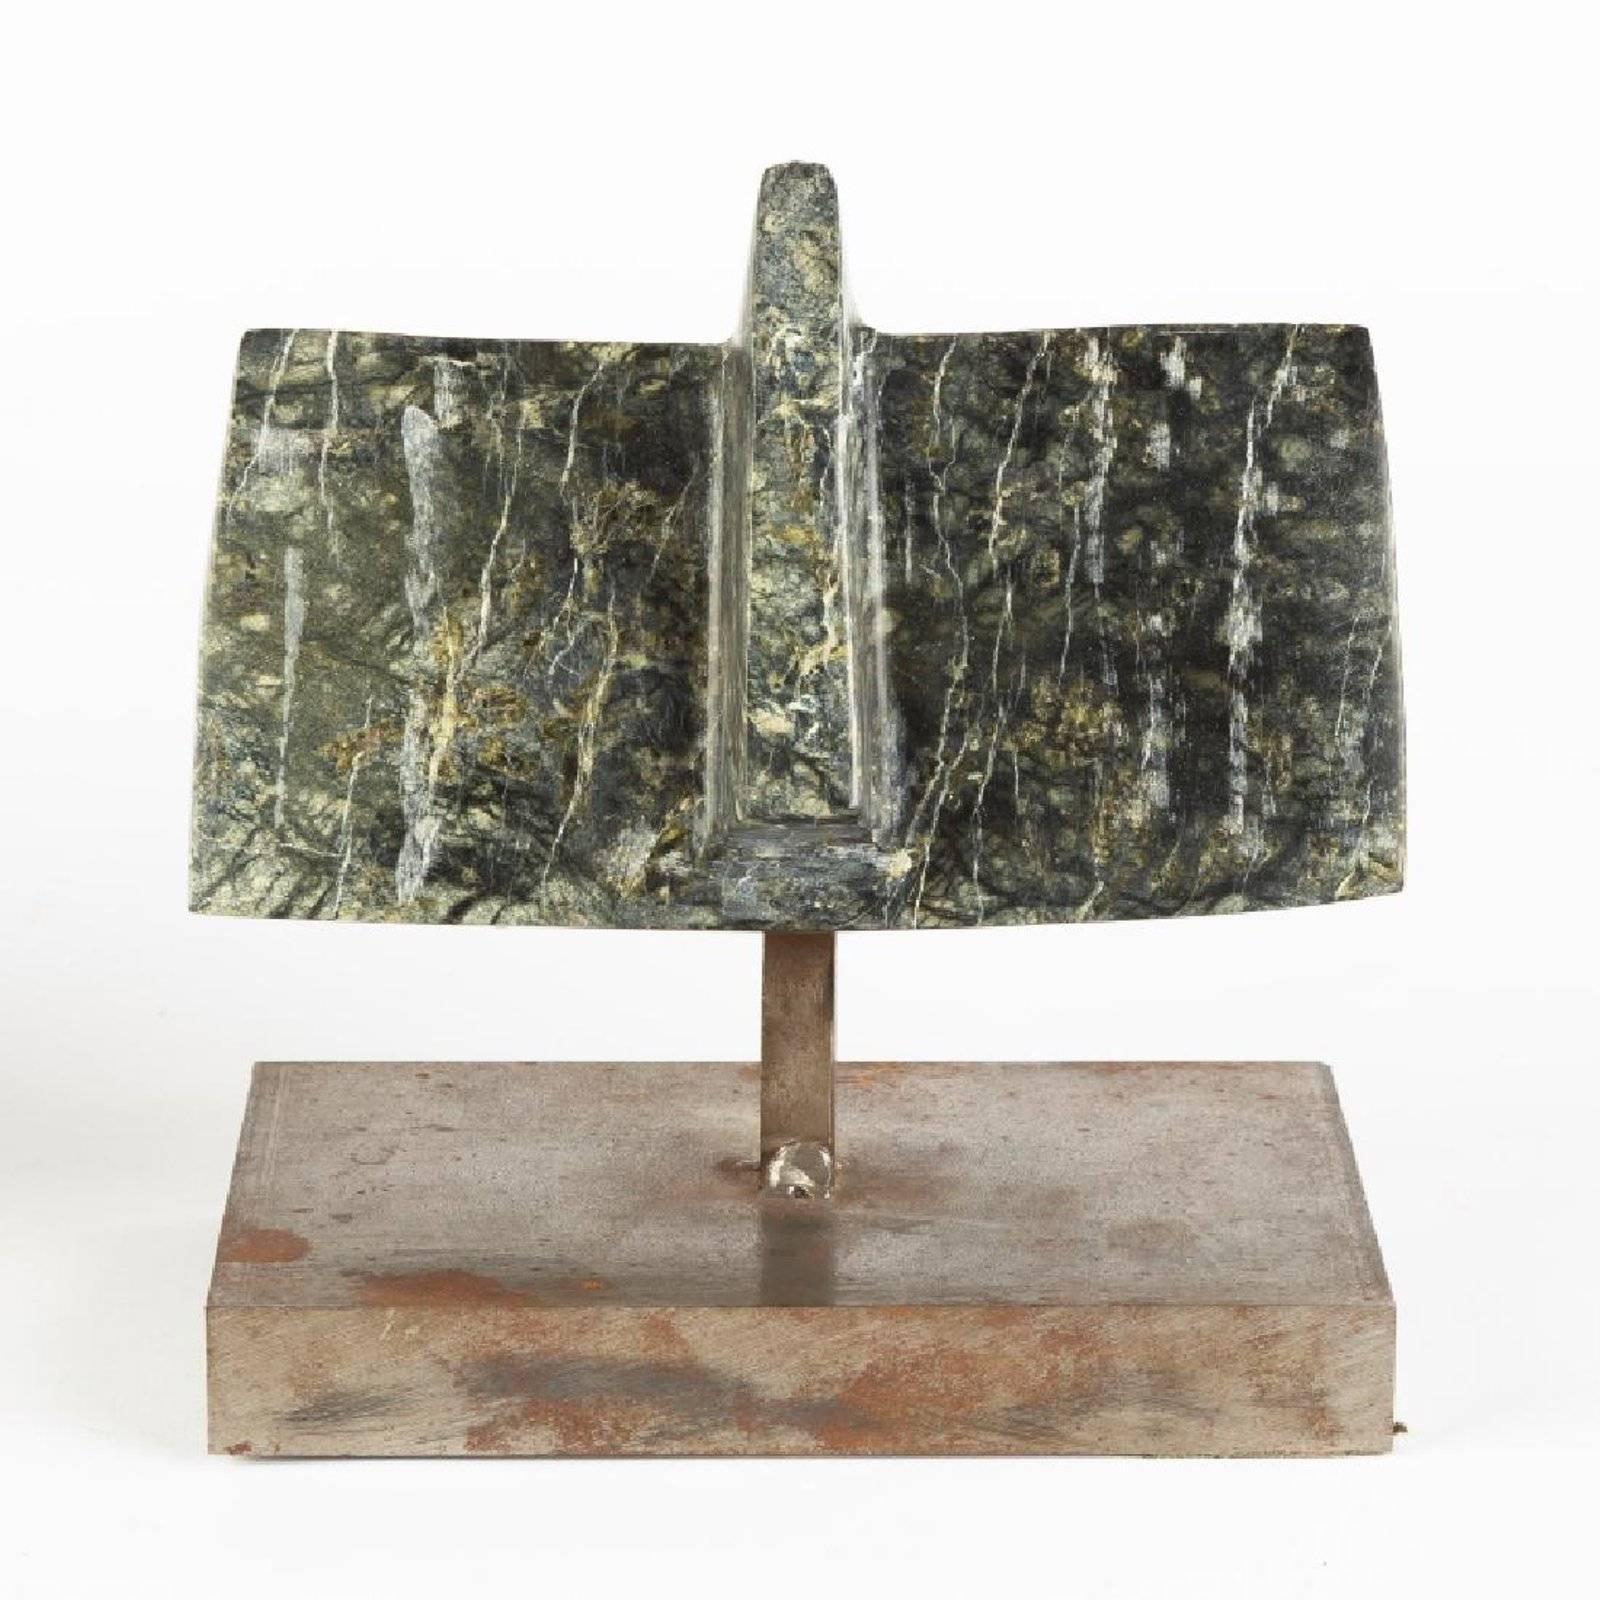 Galerie La Pochade, Paris France. Abstract Marble Sculpture